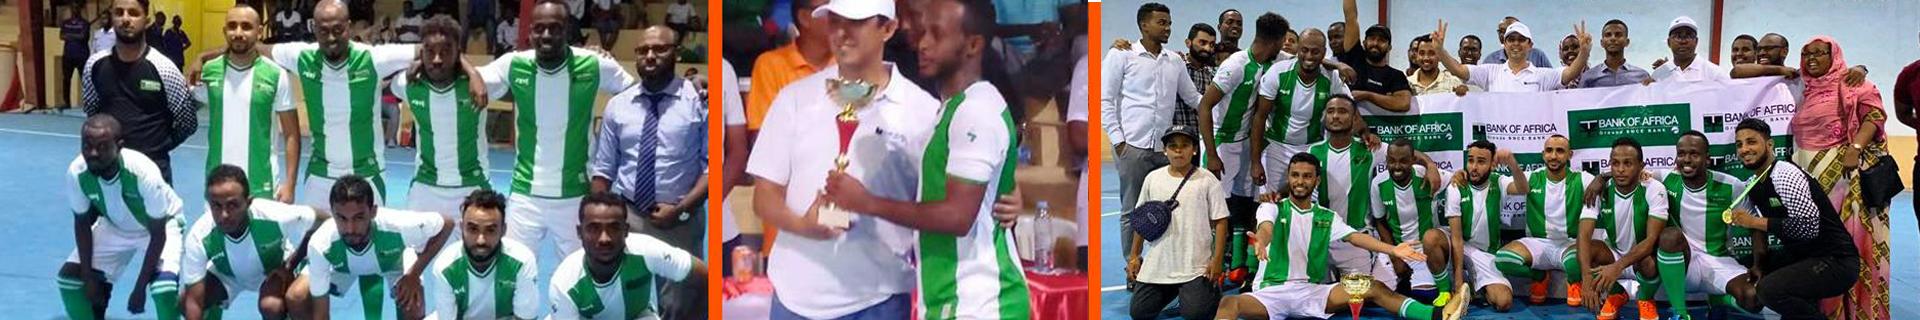 BANK OF AFRICA – MER ROUGE remporte un tournoi de Futsal